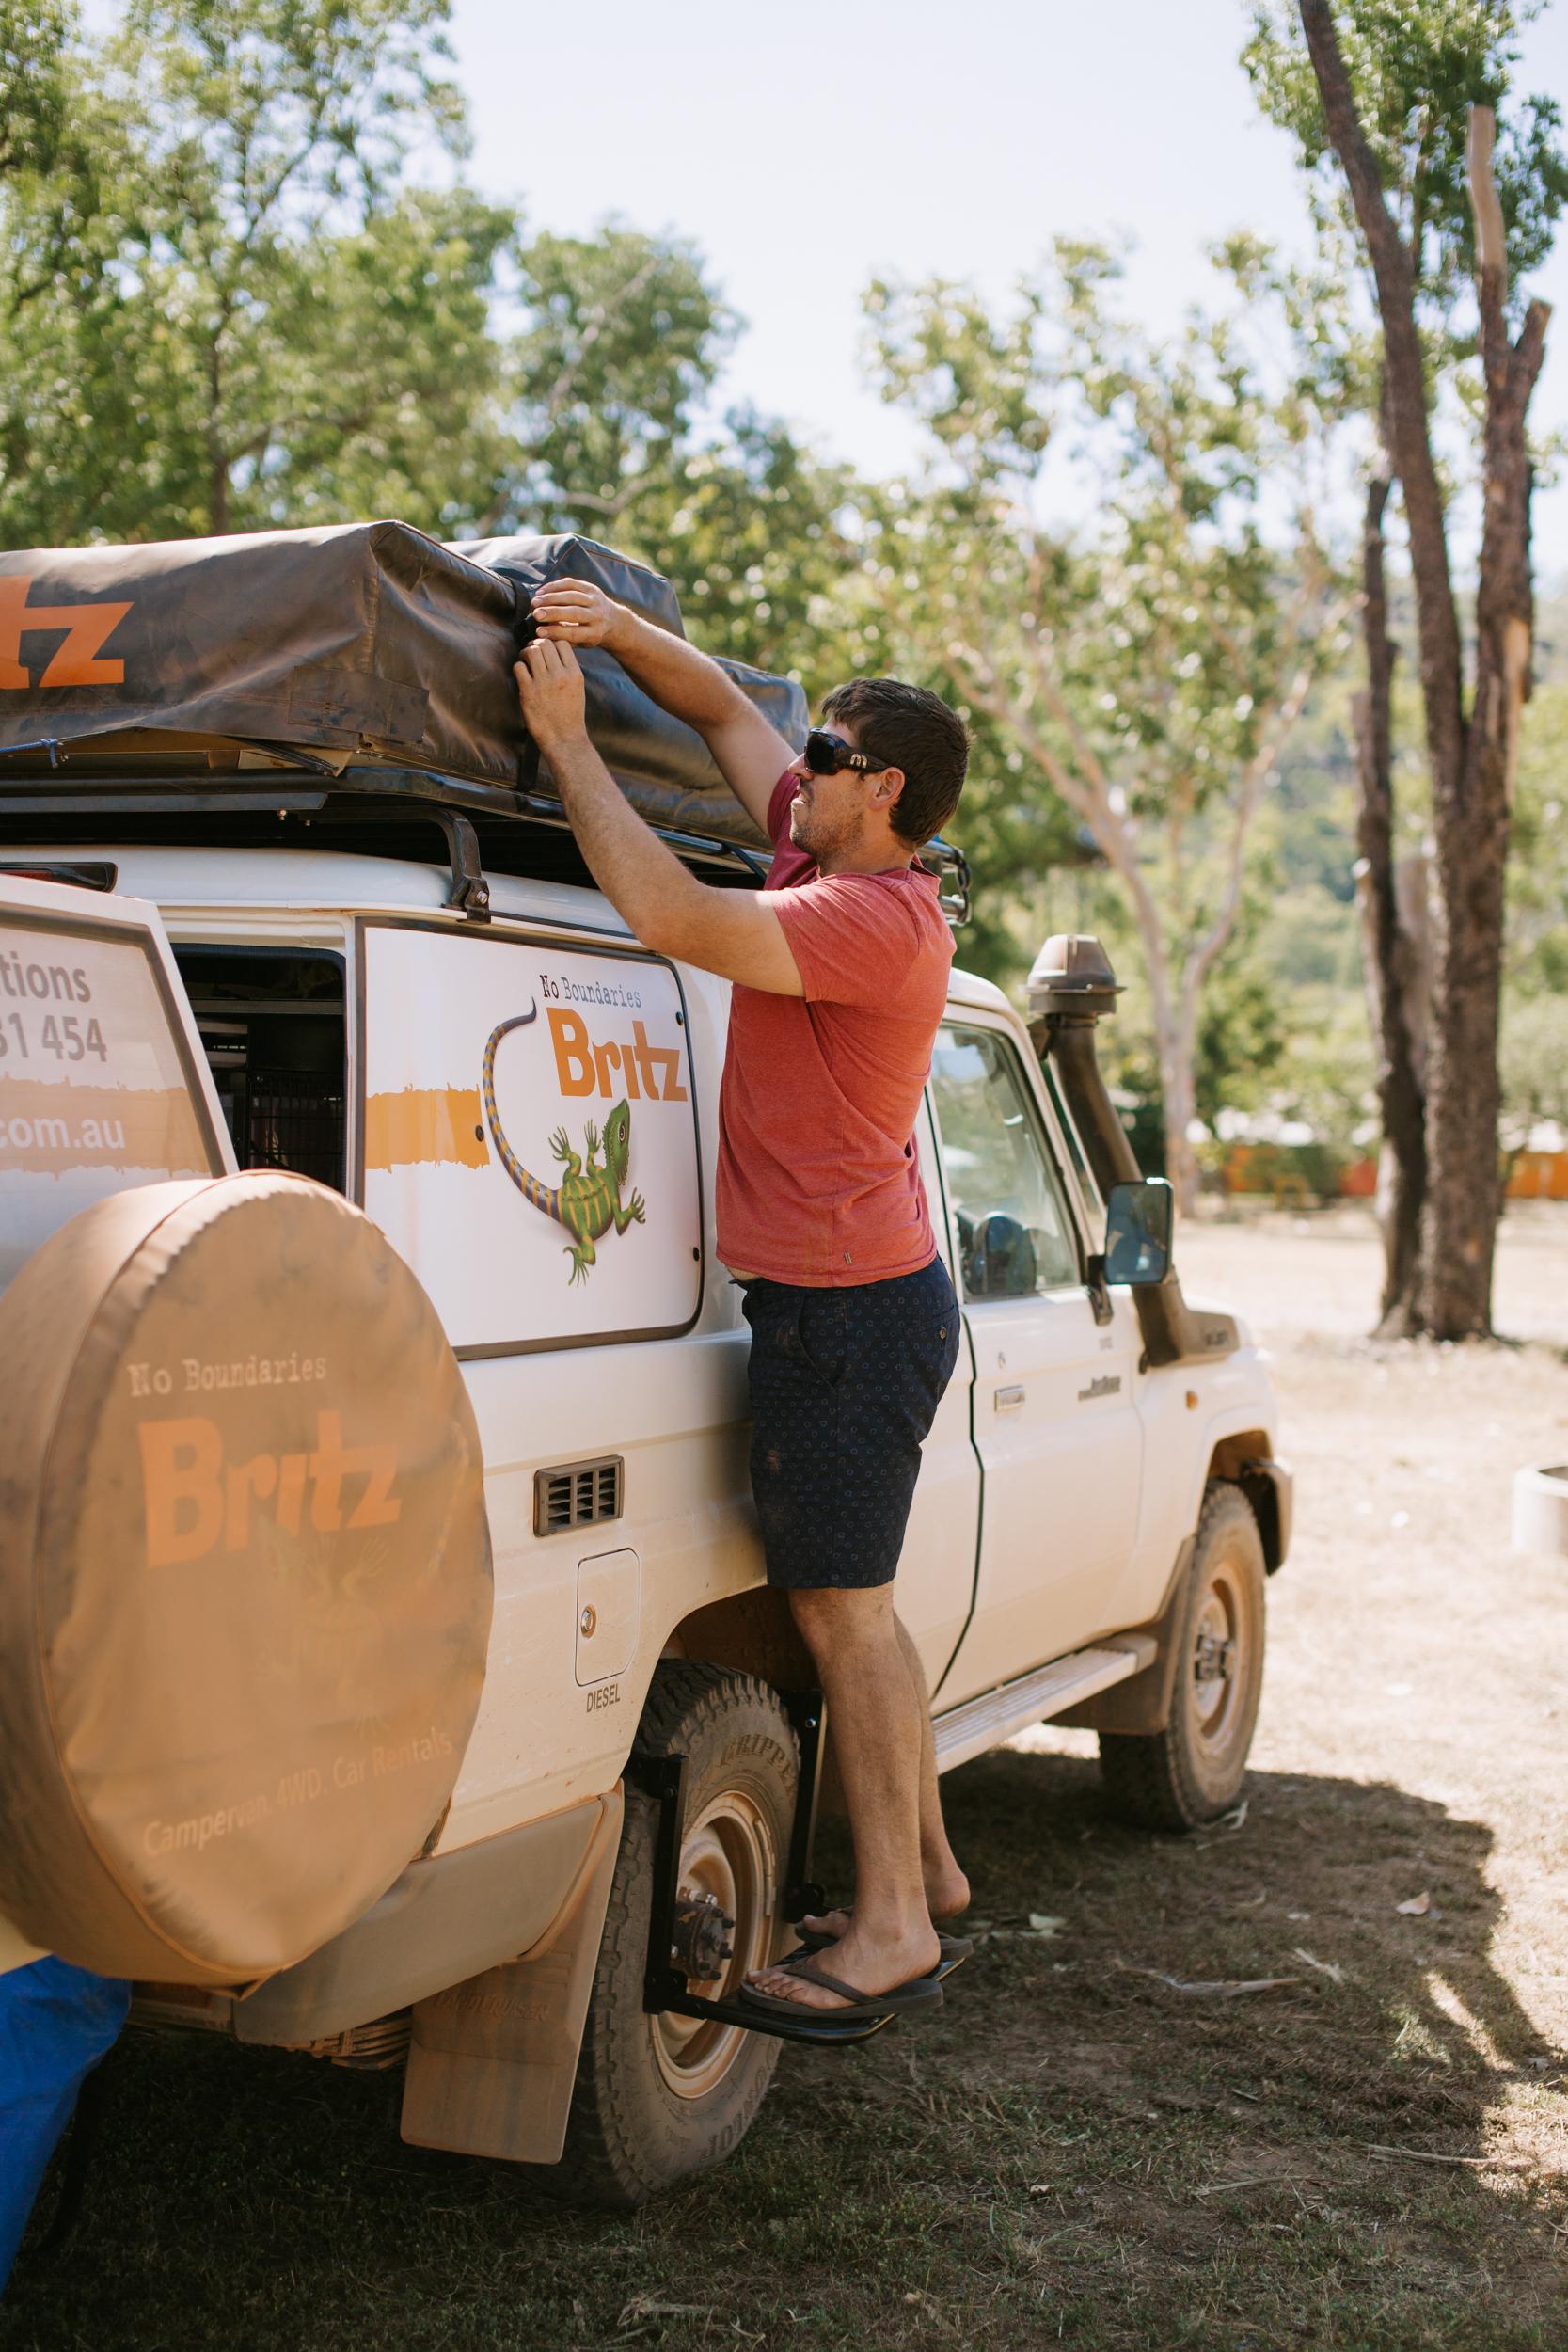 4wd Camper Britz Safari Landcruiser Australia Australia